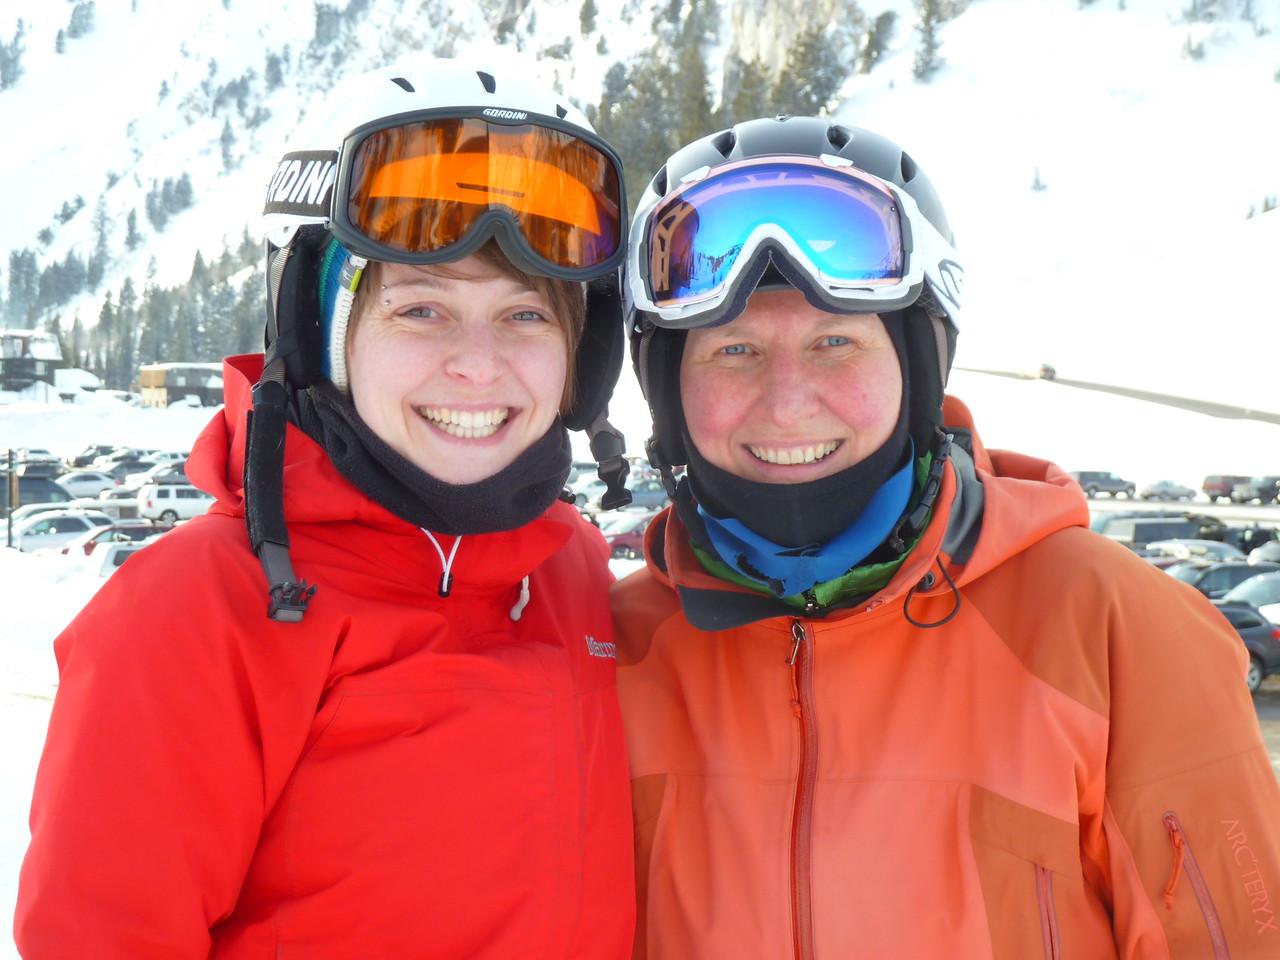 Miriam and Annette